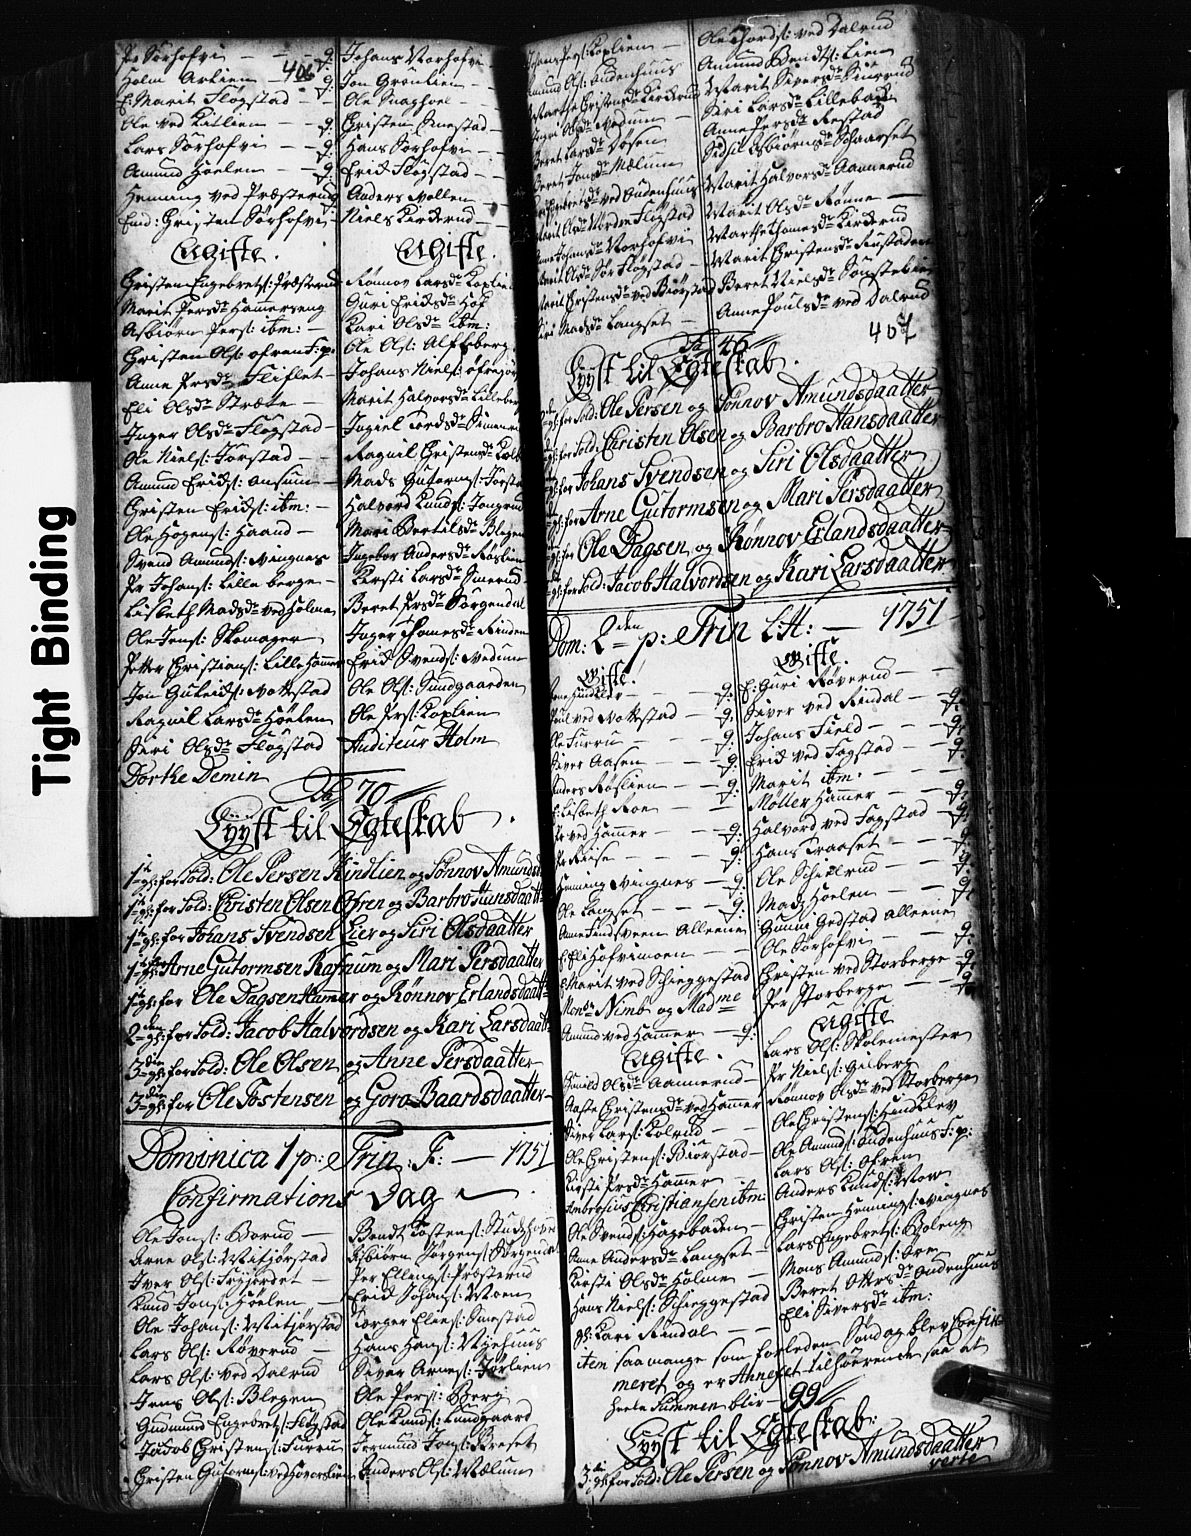 SAH, Fåberg prestekontor, Klokkerbok nr. 2, 1741-1756, s. 406-407